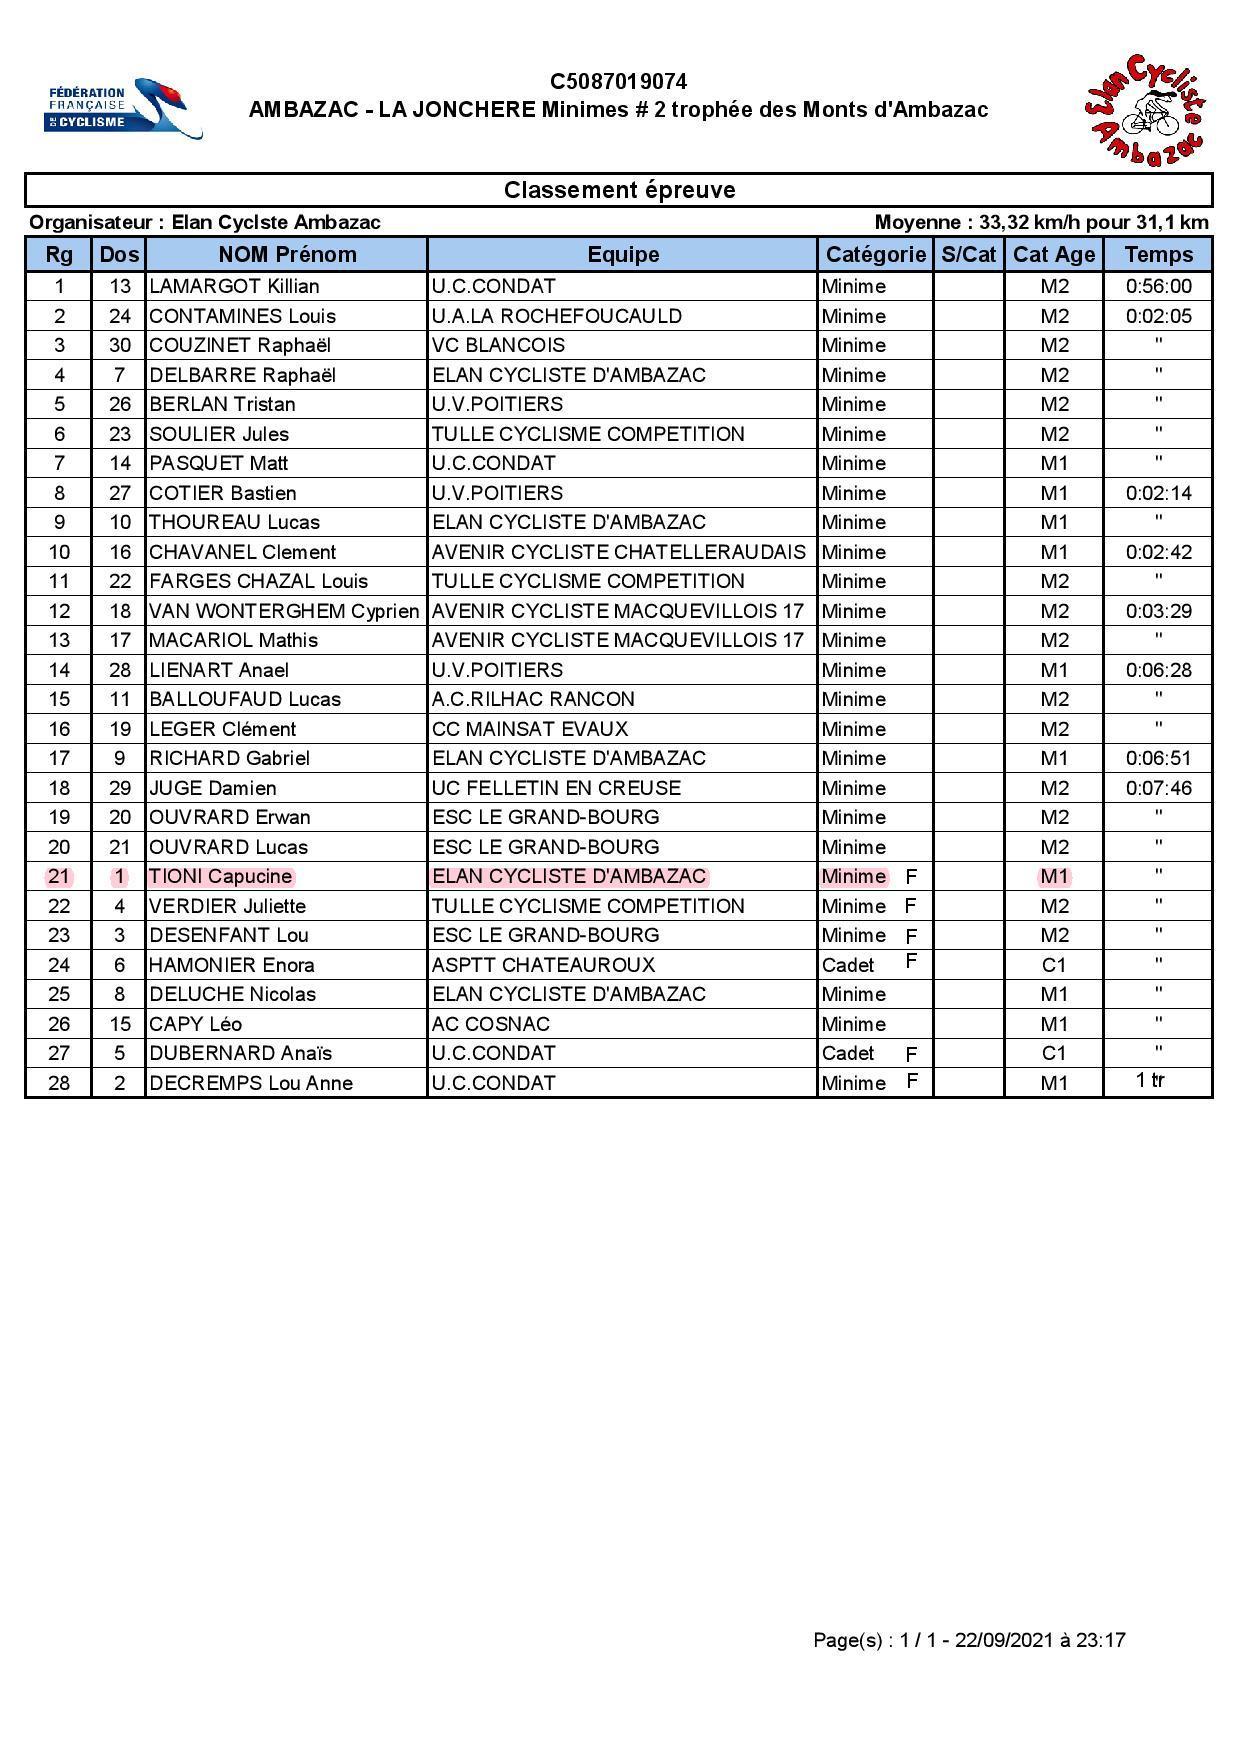 Minimes classement course 19 09 2021 page 001 1